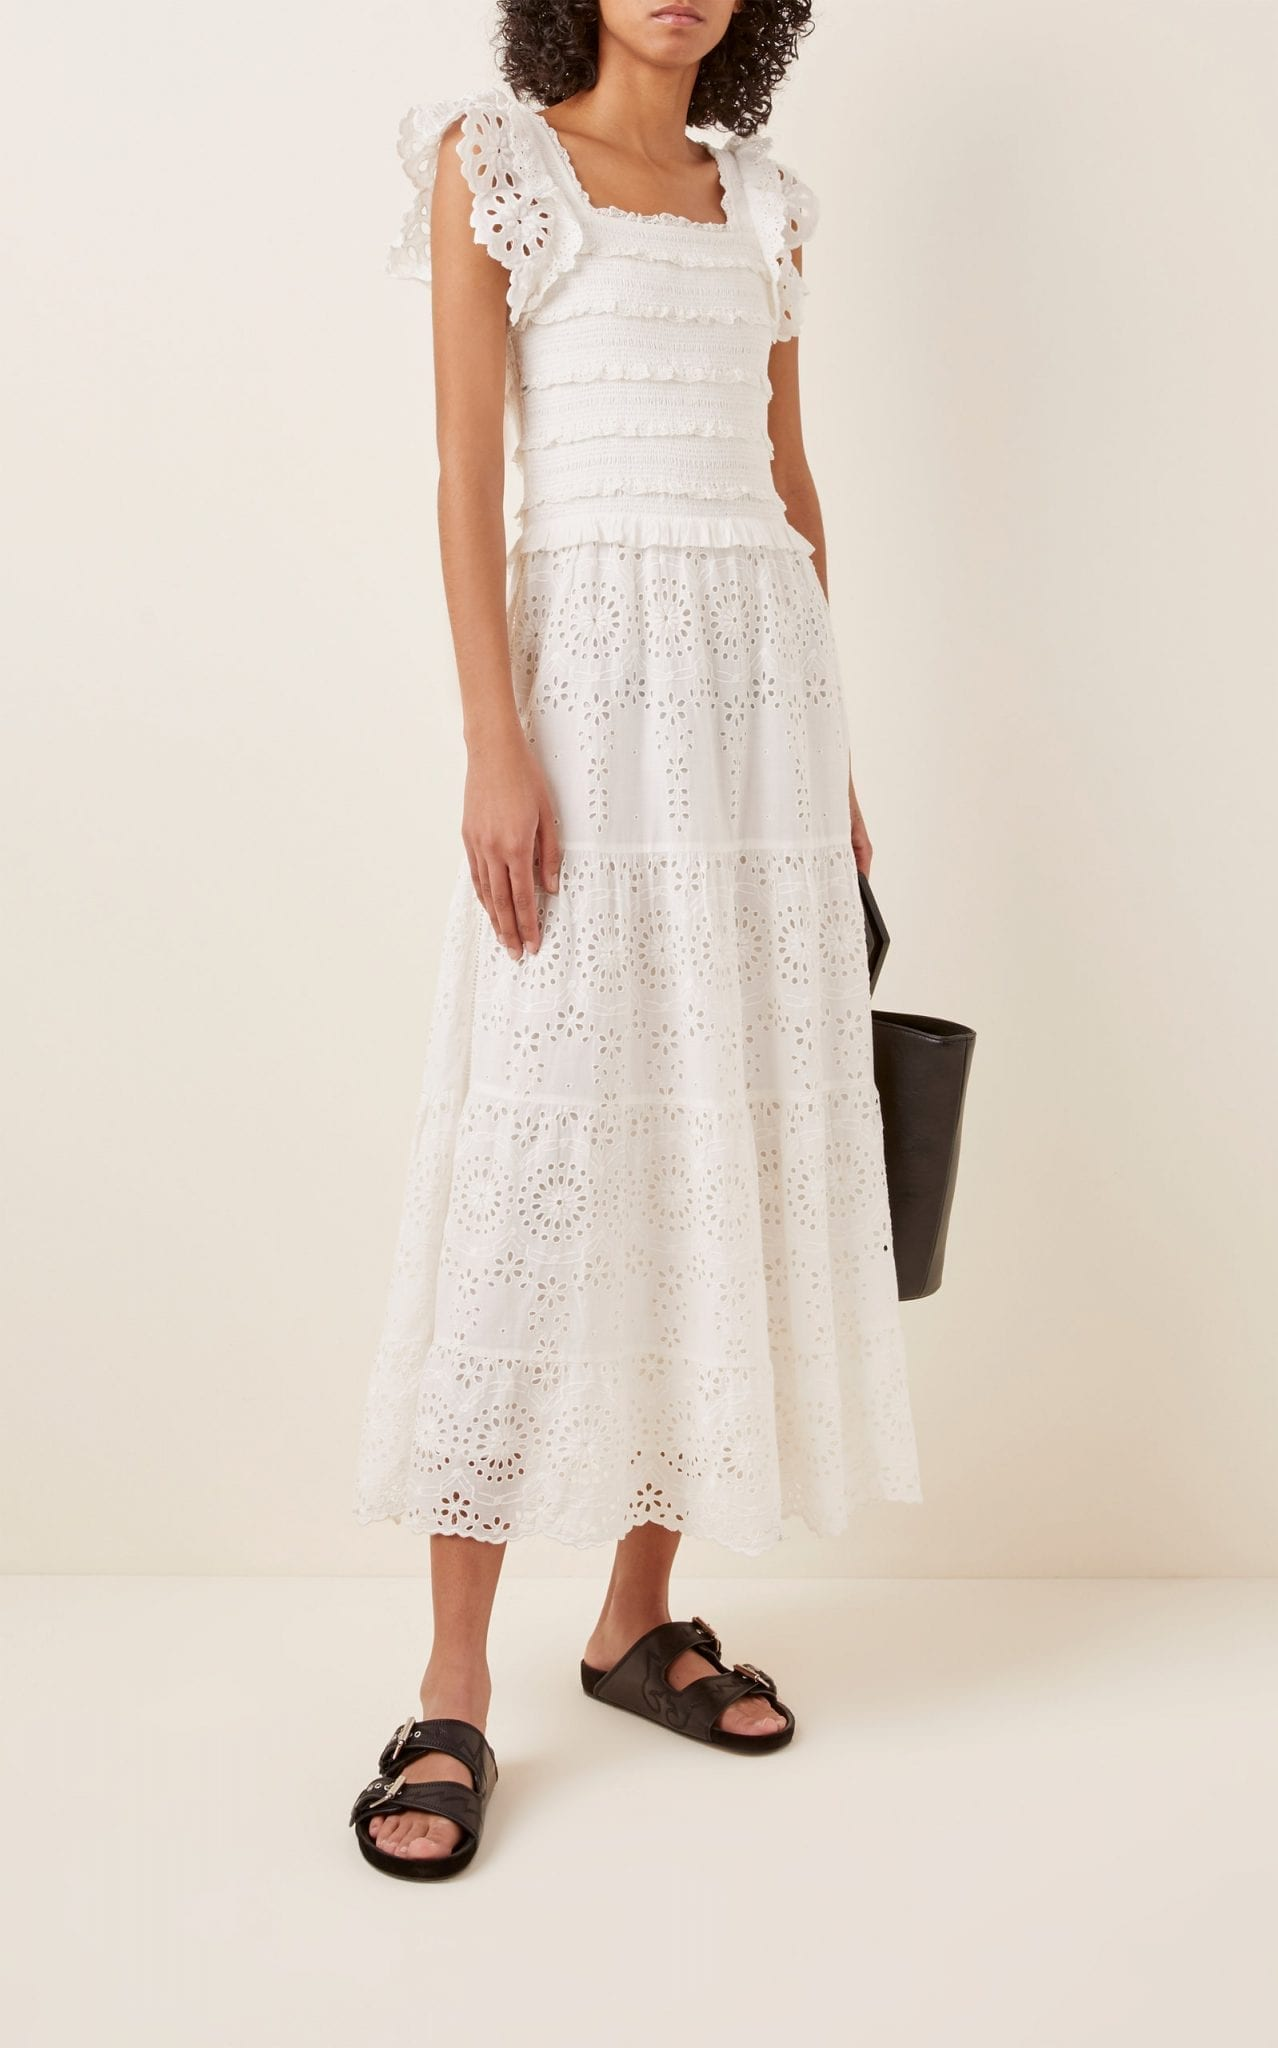 SEA Daisy Smocked Cotton-Poplin Midi Dress